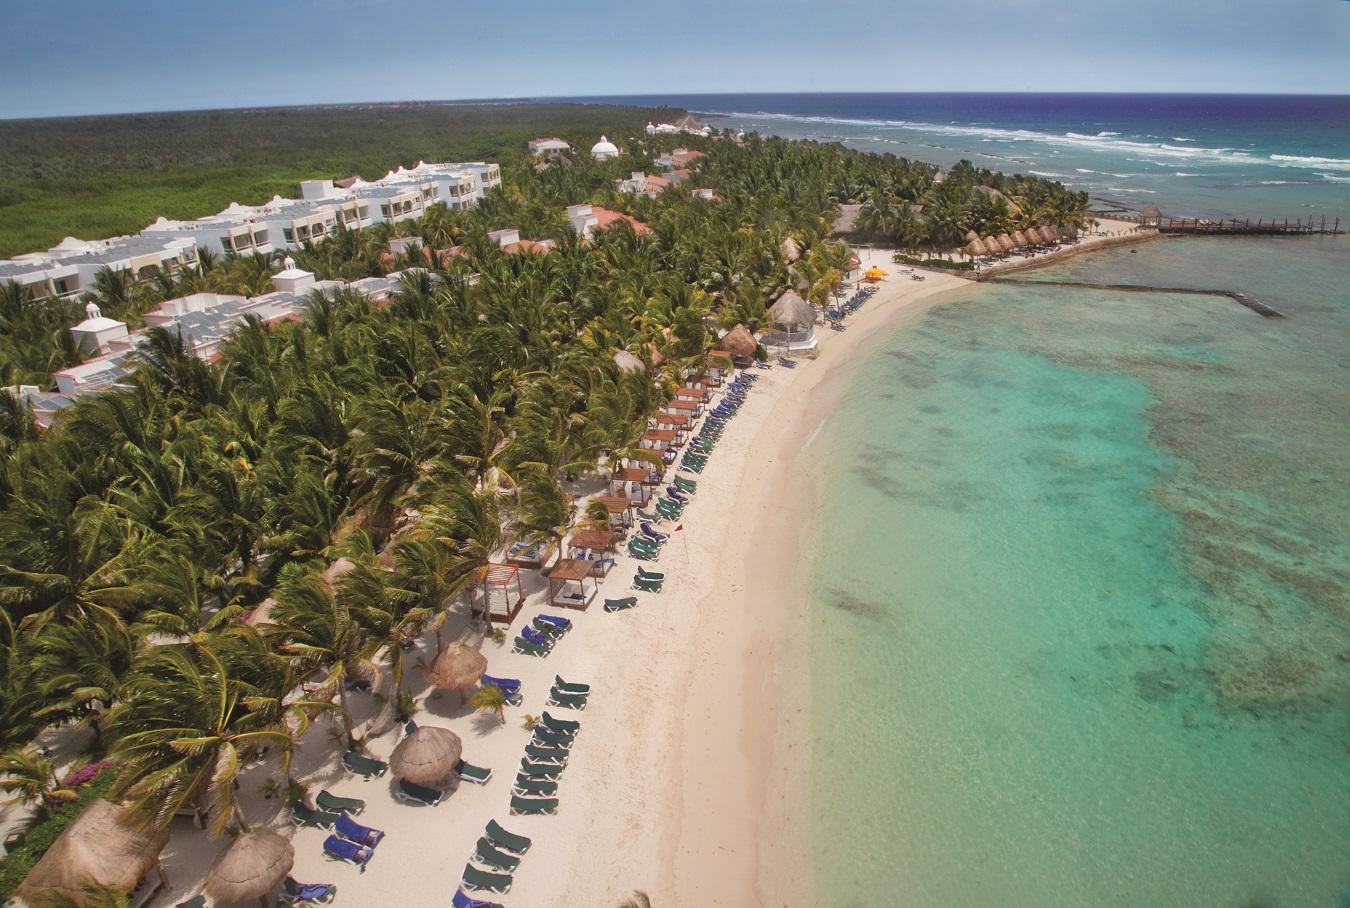 dorado seaside suites aerial view